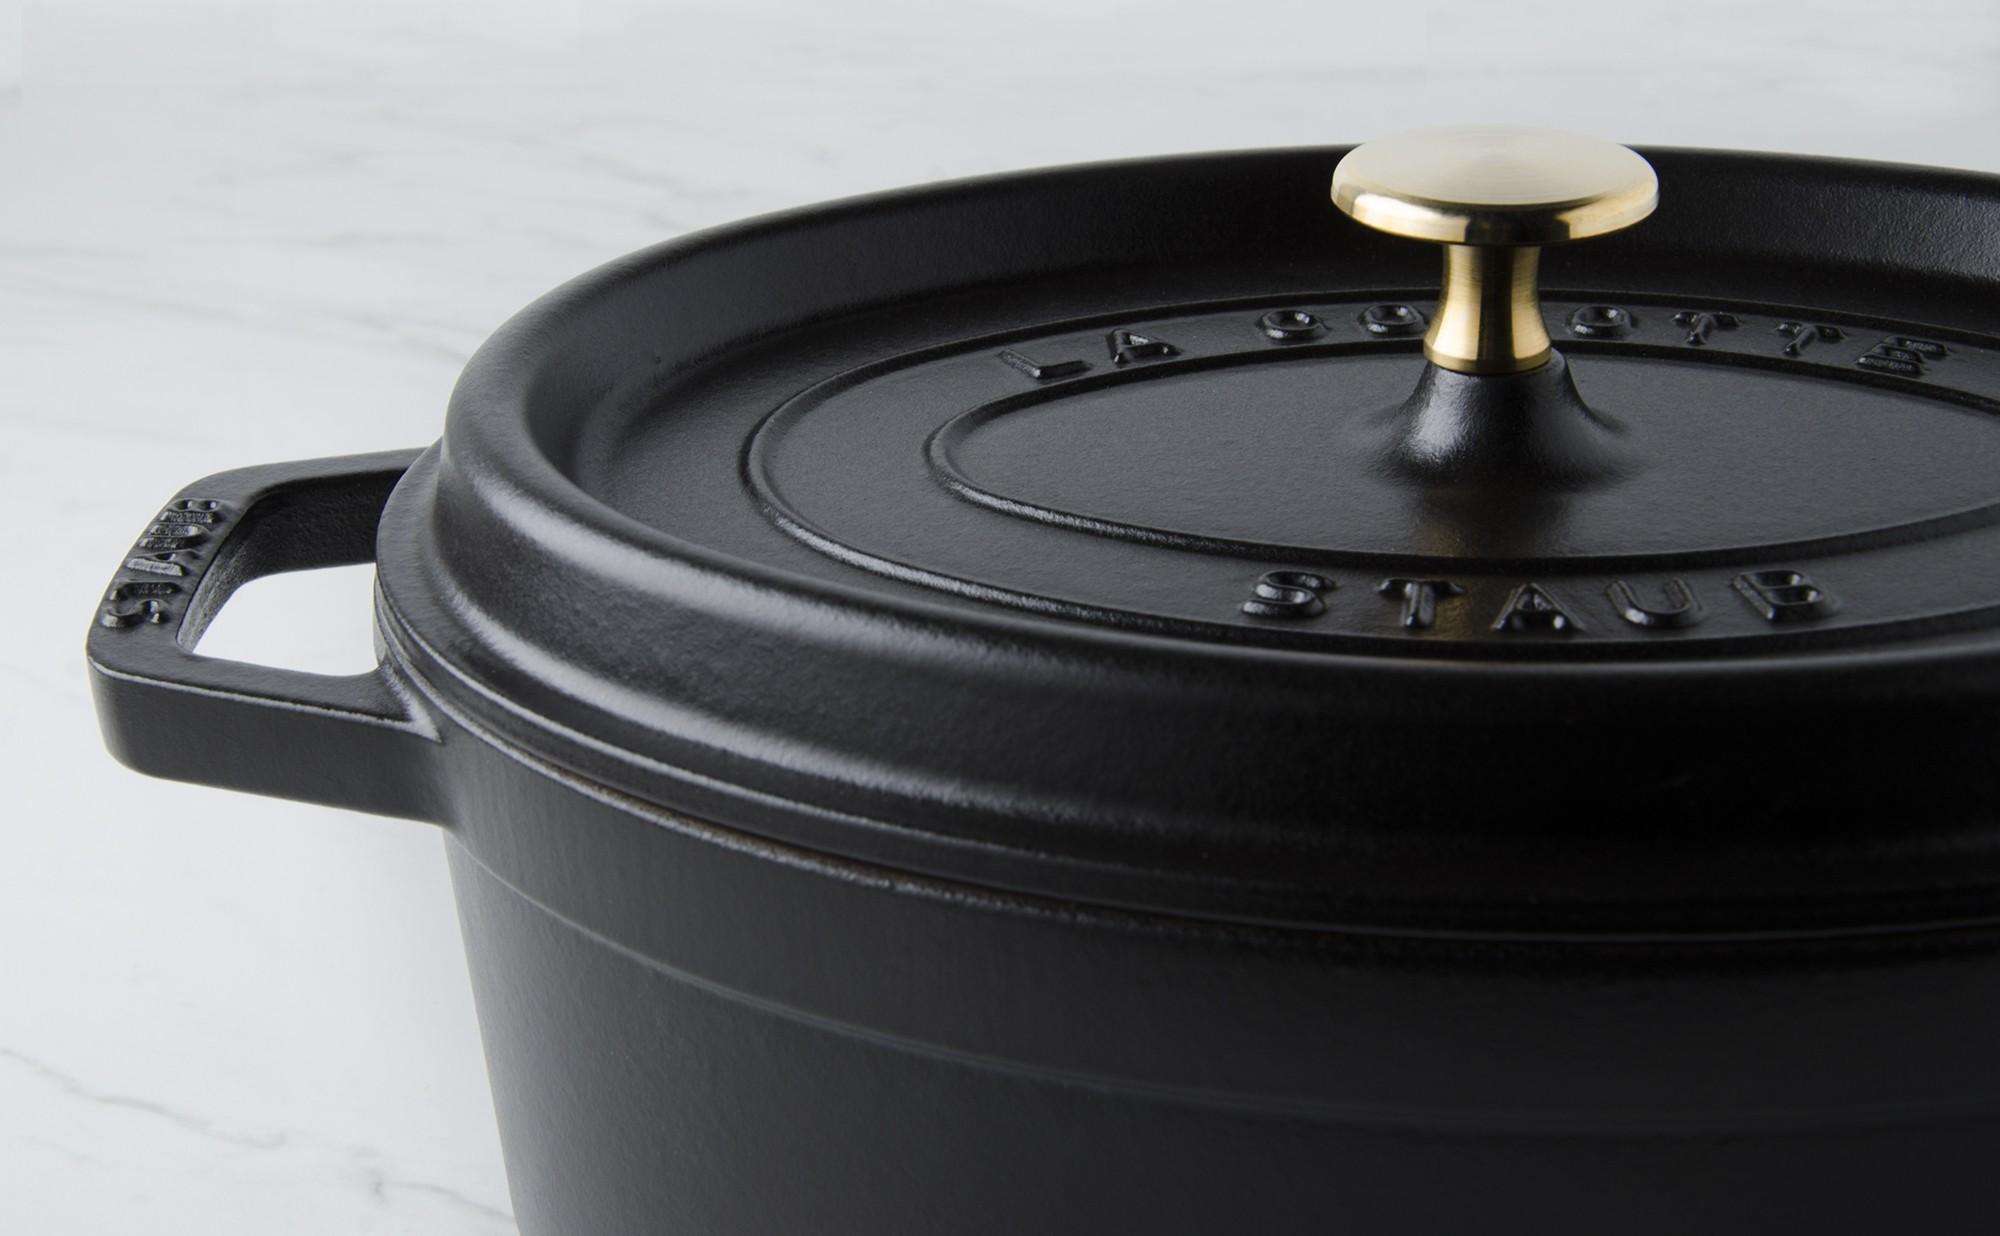 cocotte ovale fonte noire 23 cm. Black Bedroom Furniture Sets. Home Design Ideas